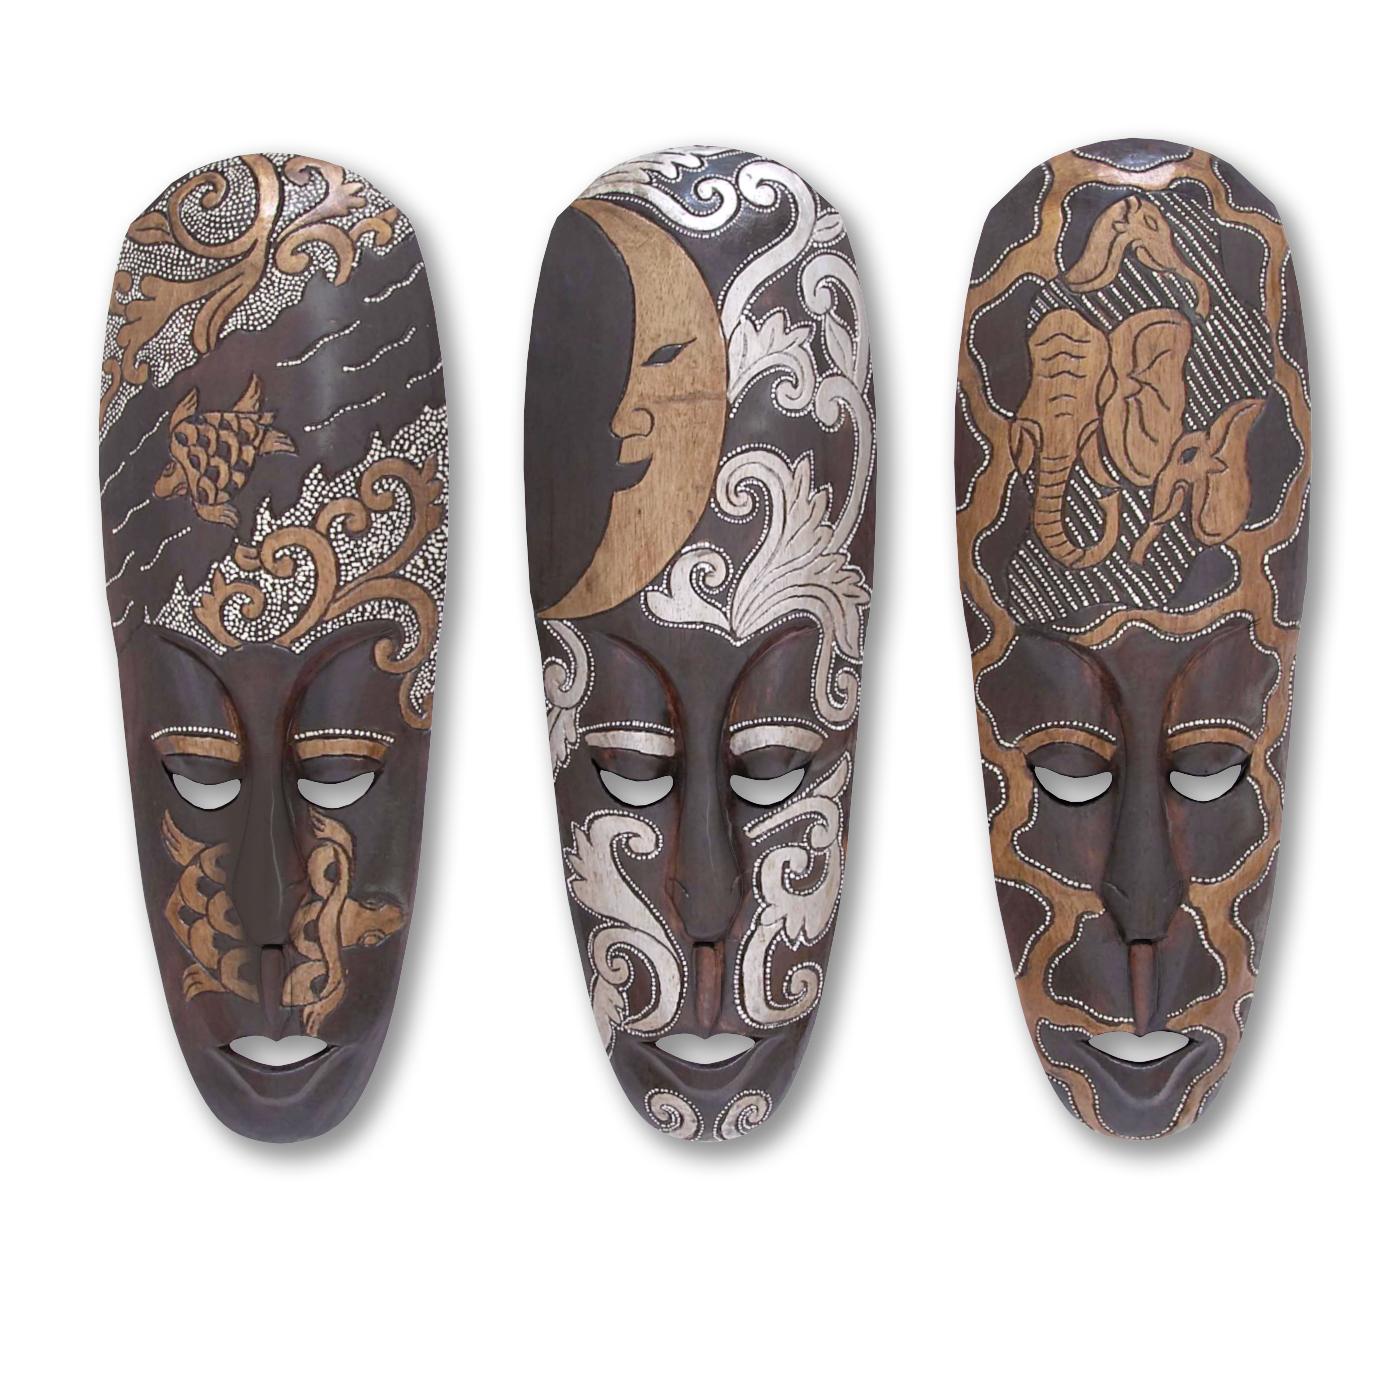 Afričke maske - Page 4 Ma10000.jpg61192a46-4f66-4e1a-a8a2-d4ea6e224309Zoom